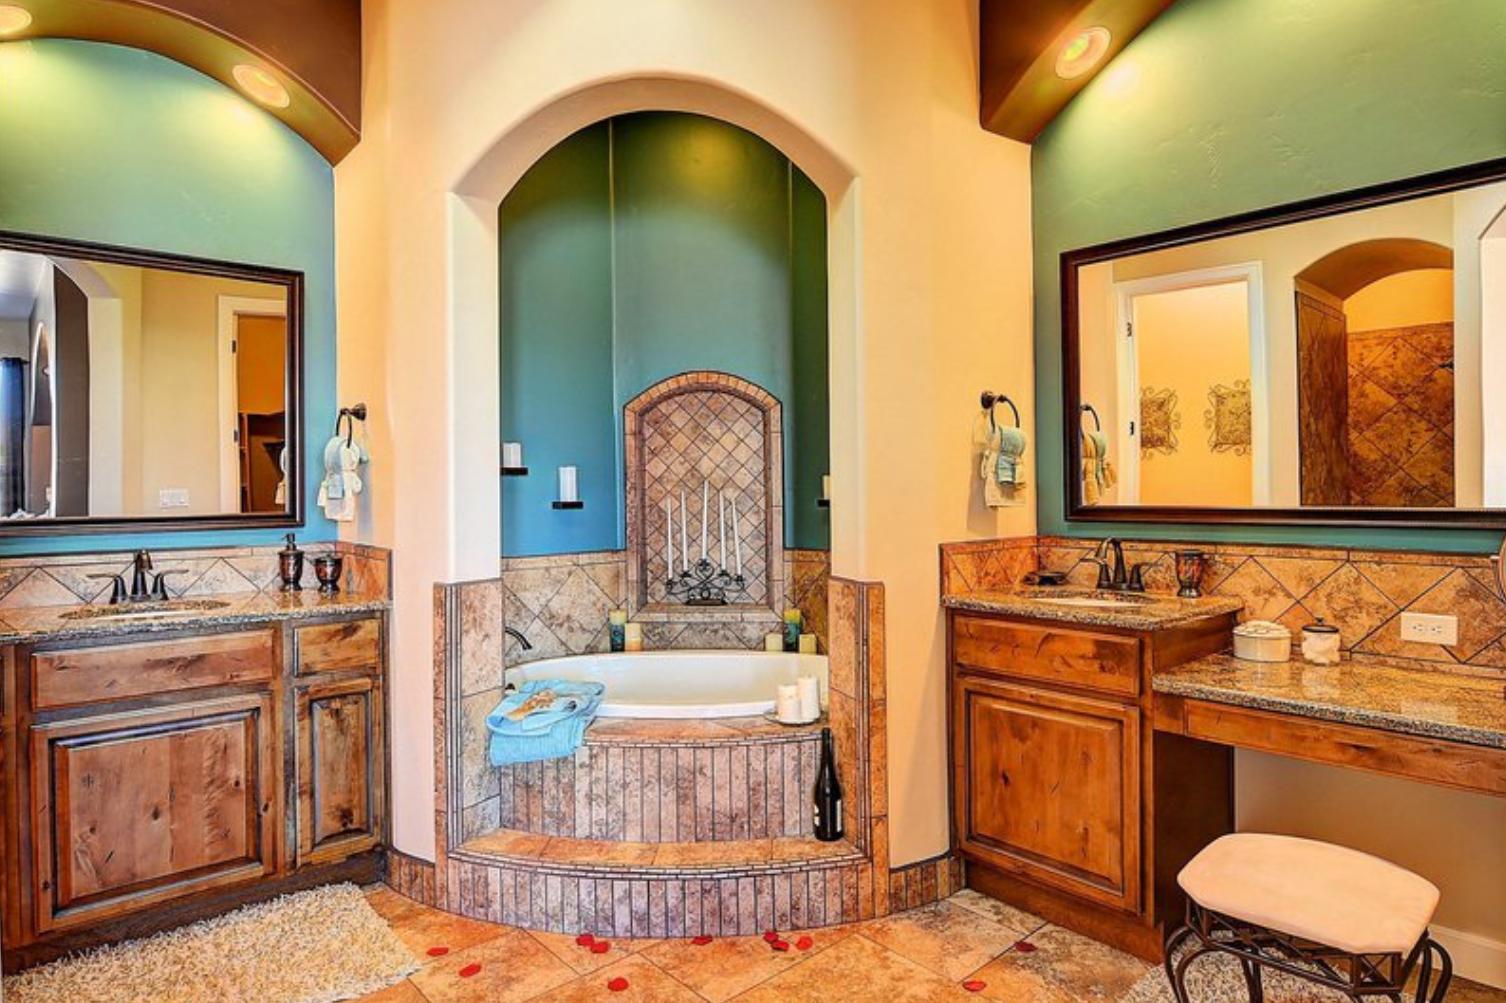 Metro Verde House Bathroom